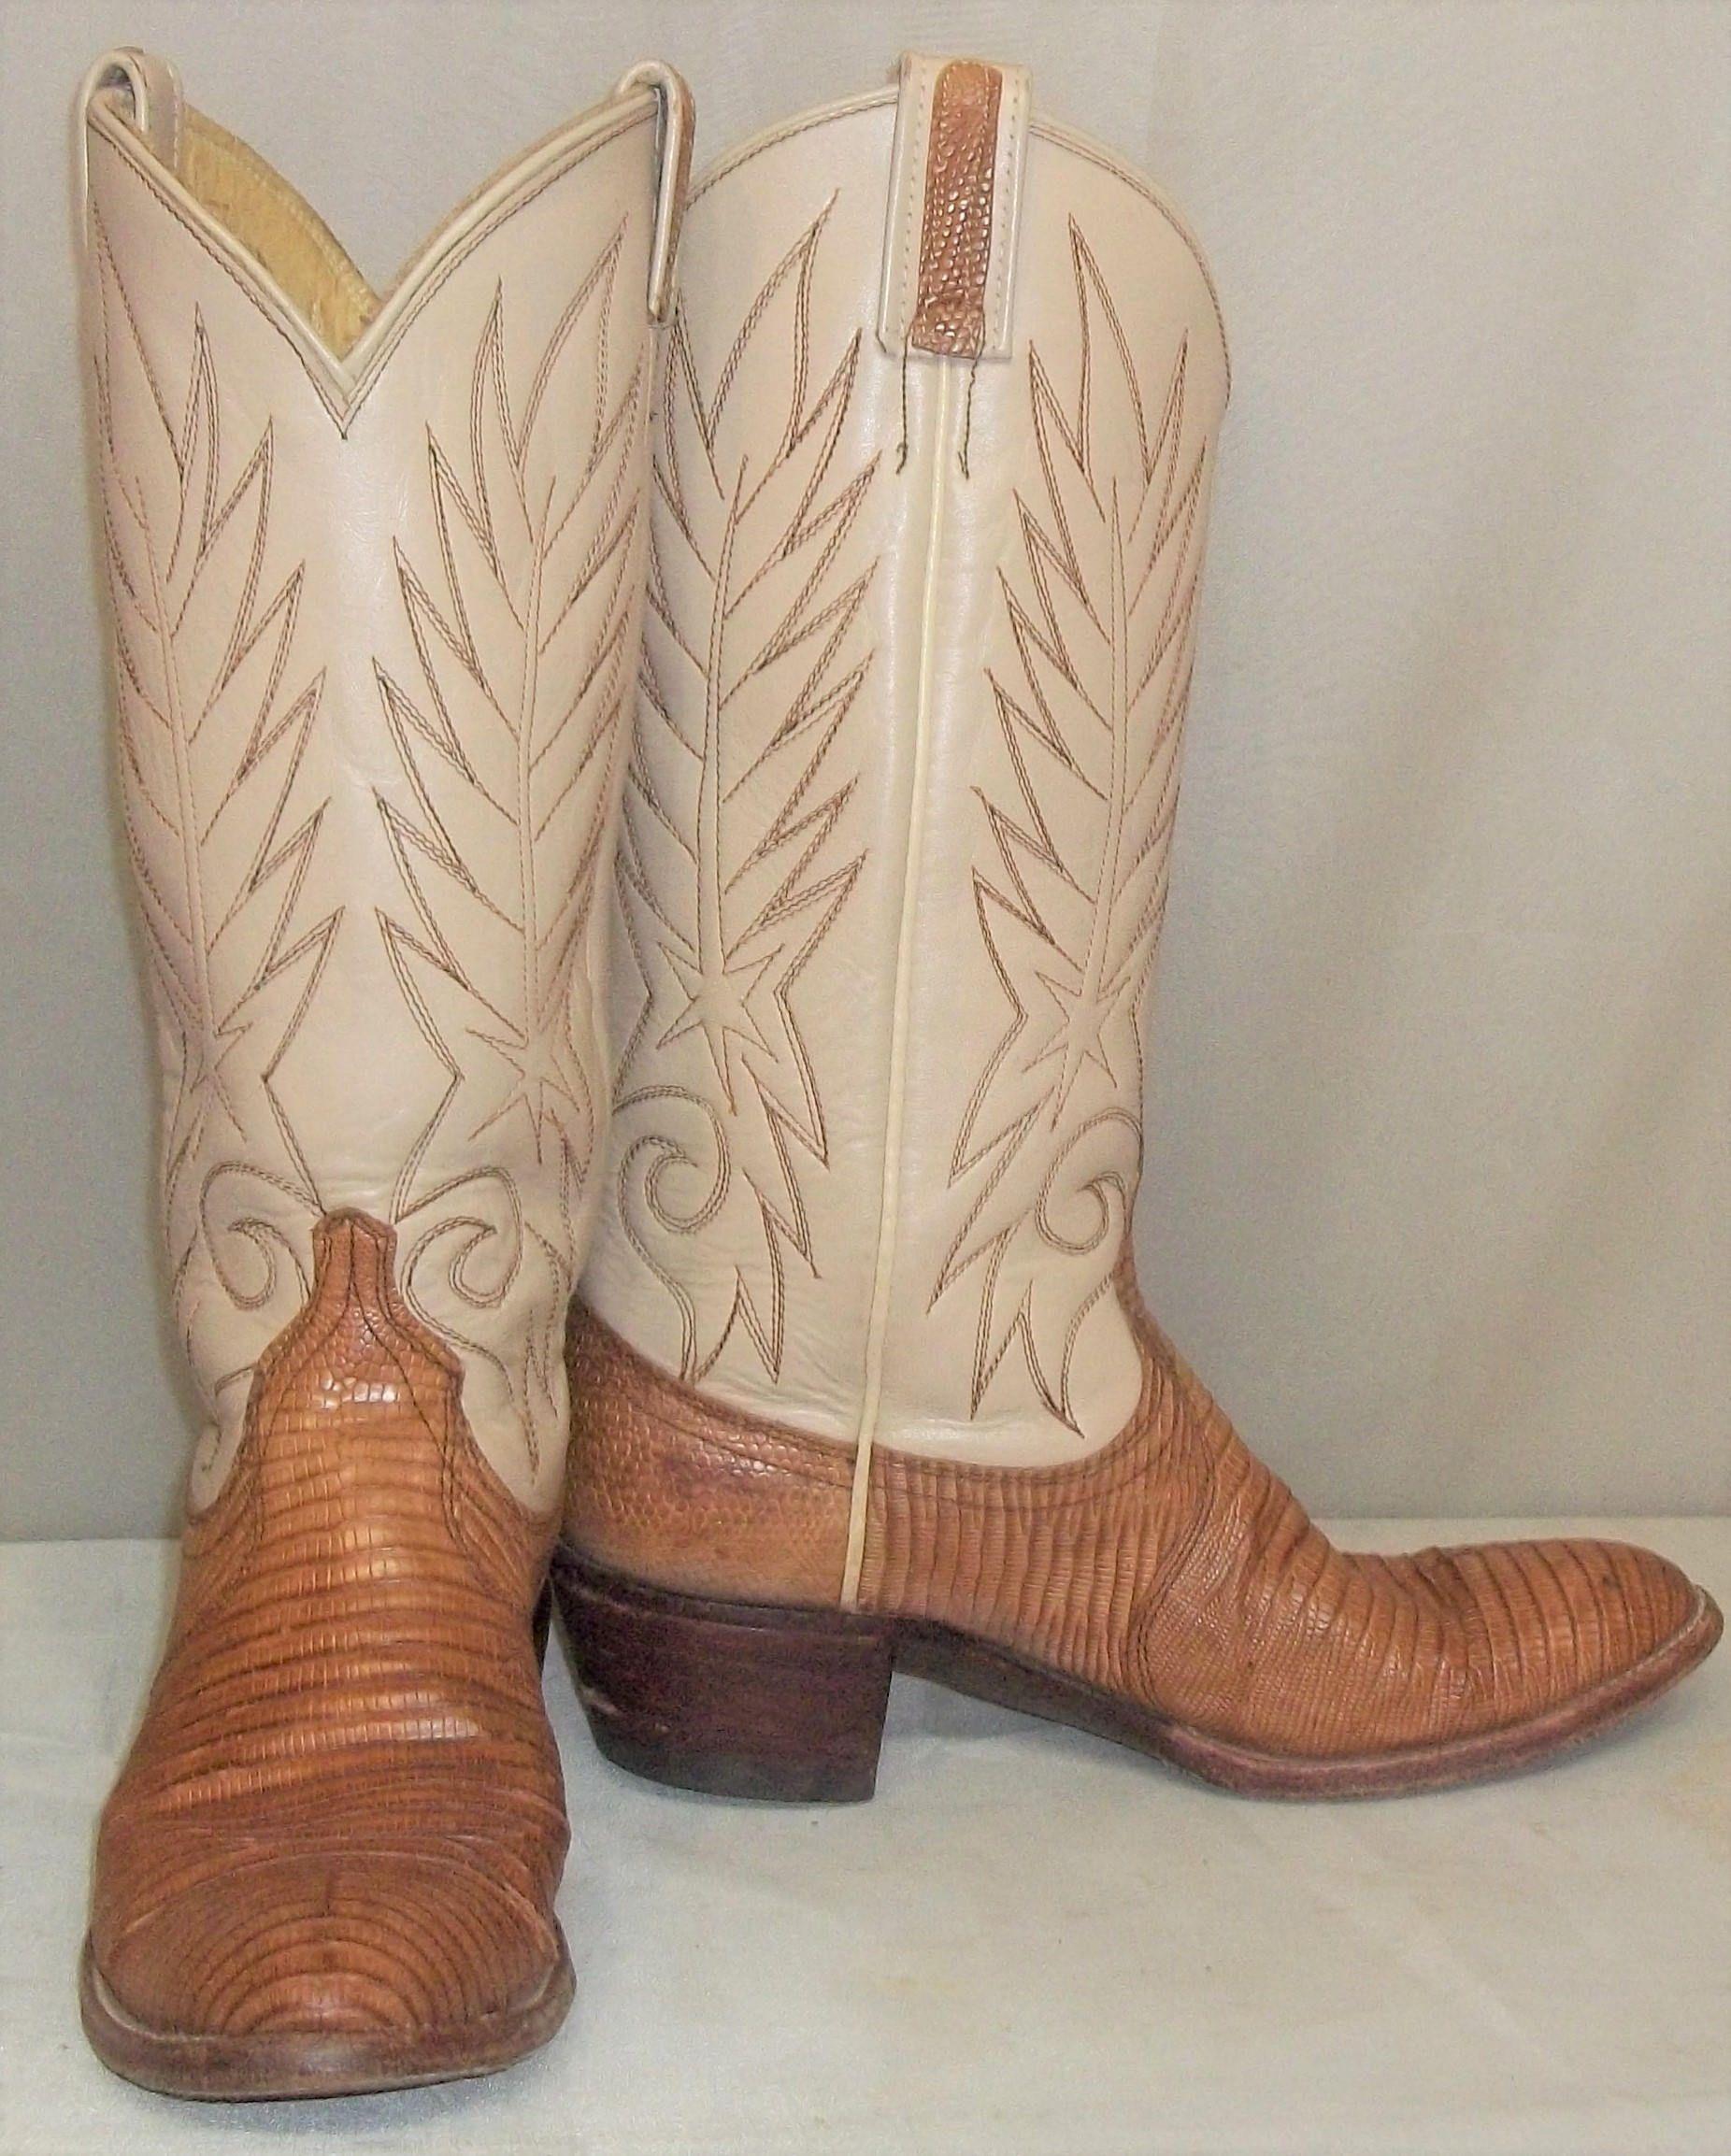 4015cb432a0 Vintage Women's Lizard Leather Beige Tan Cowboy Western Boots 6 1/2 ...